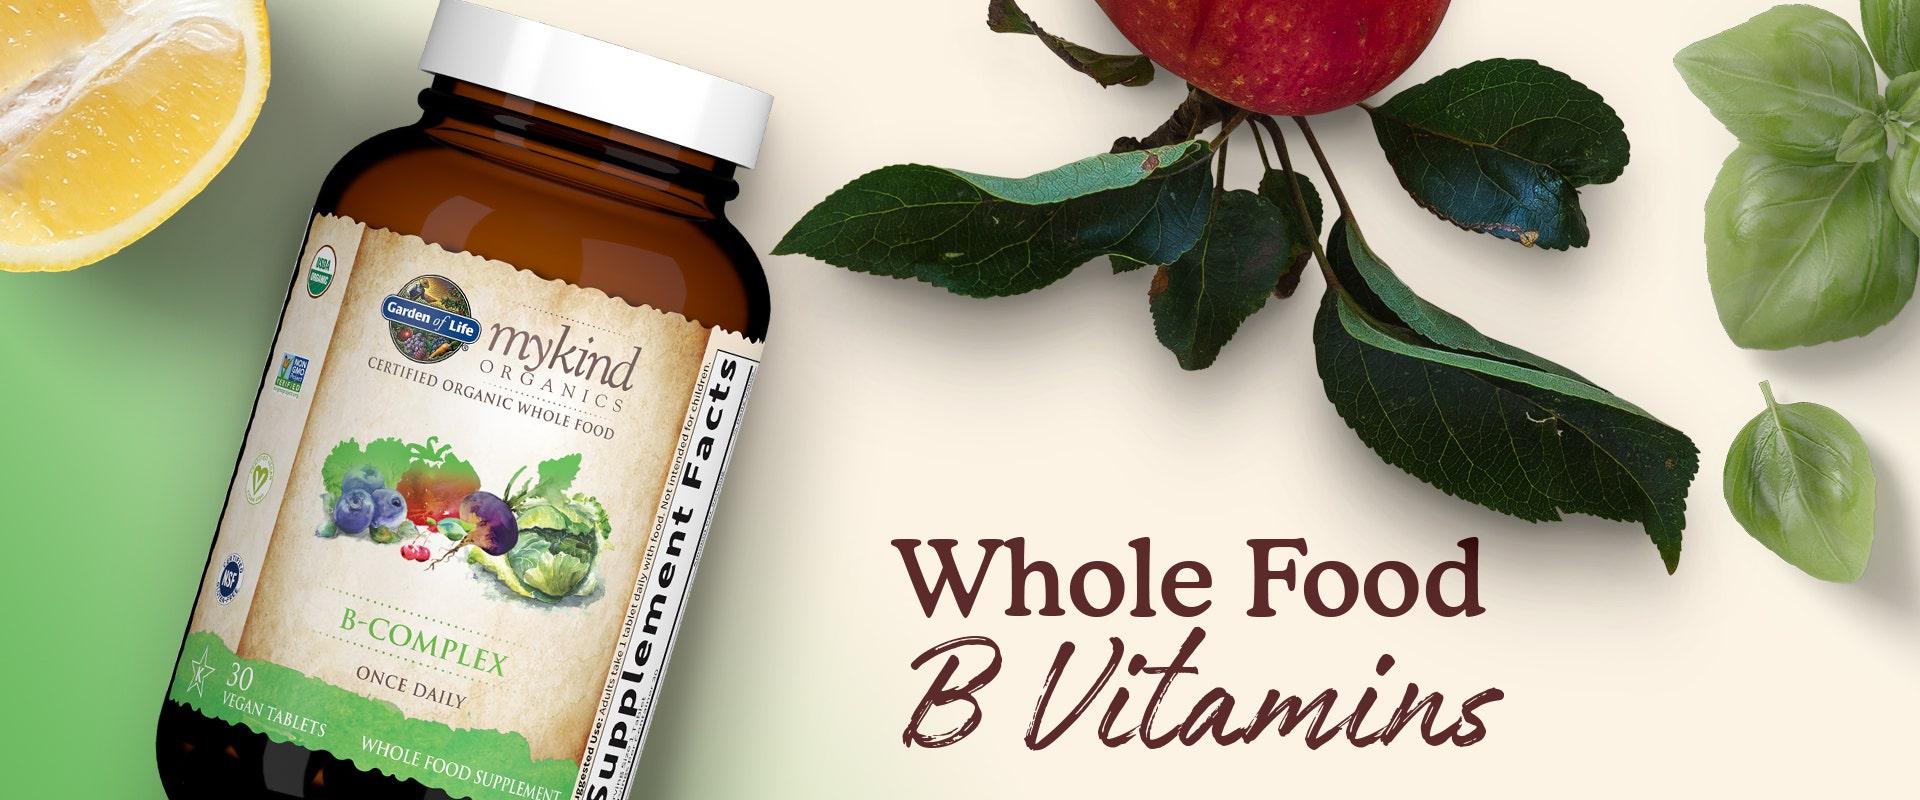 mykind Organics B-Complex Once Daily